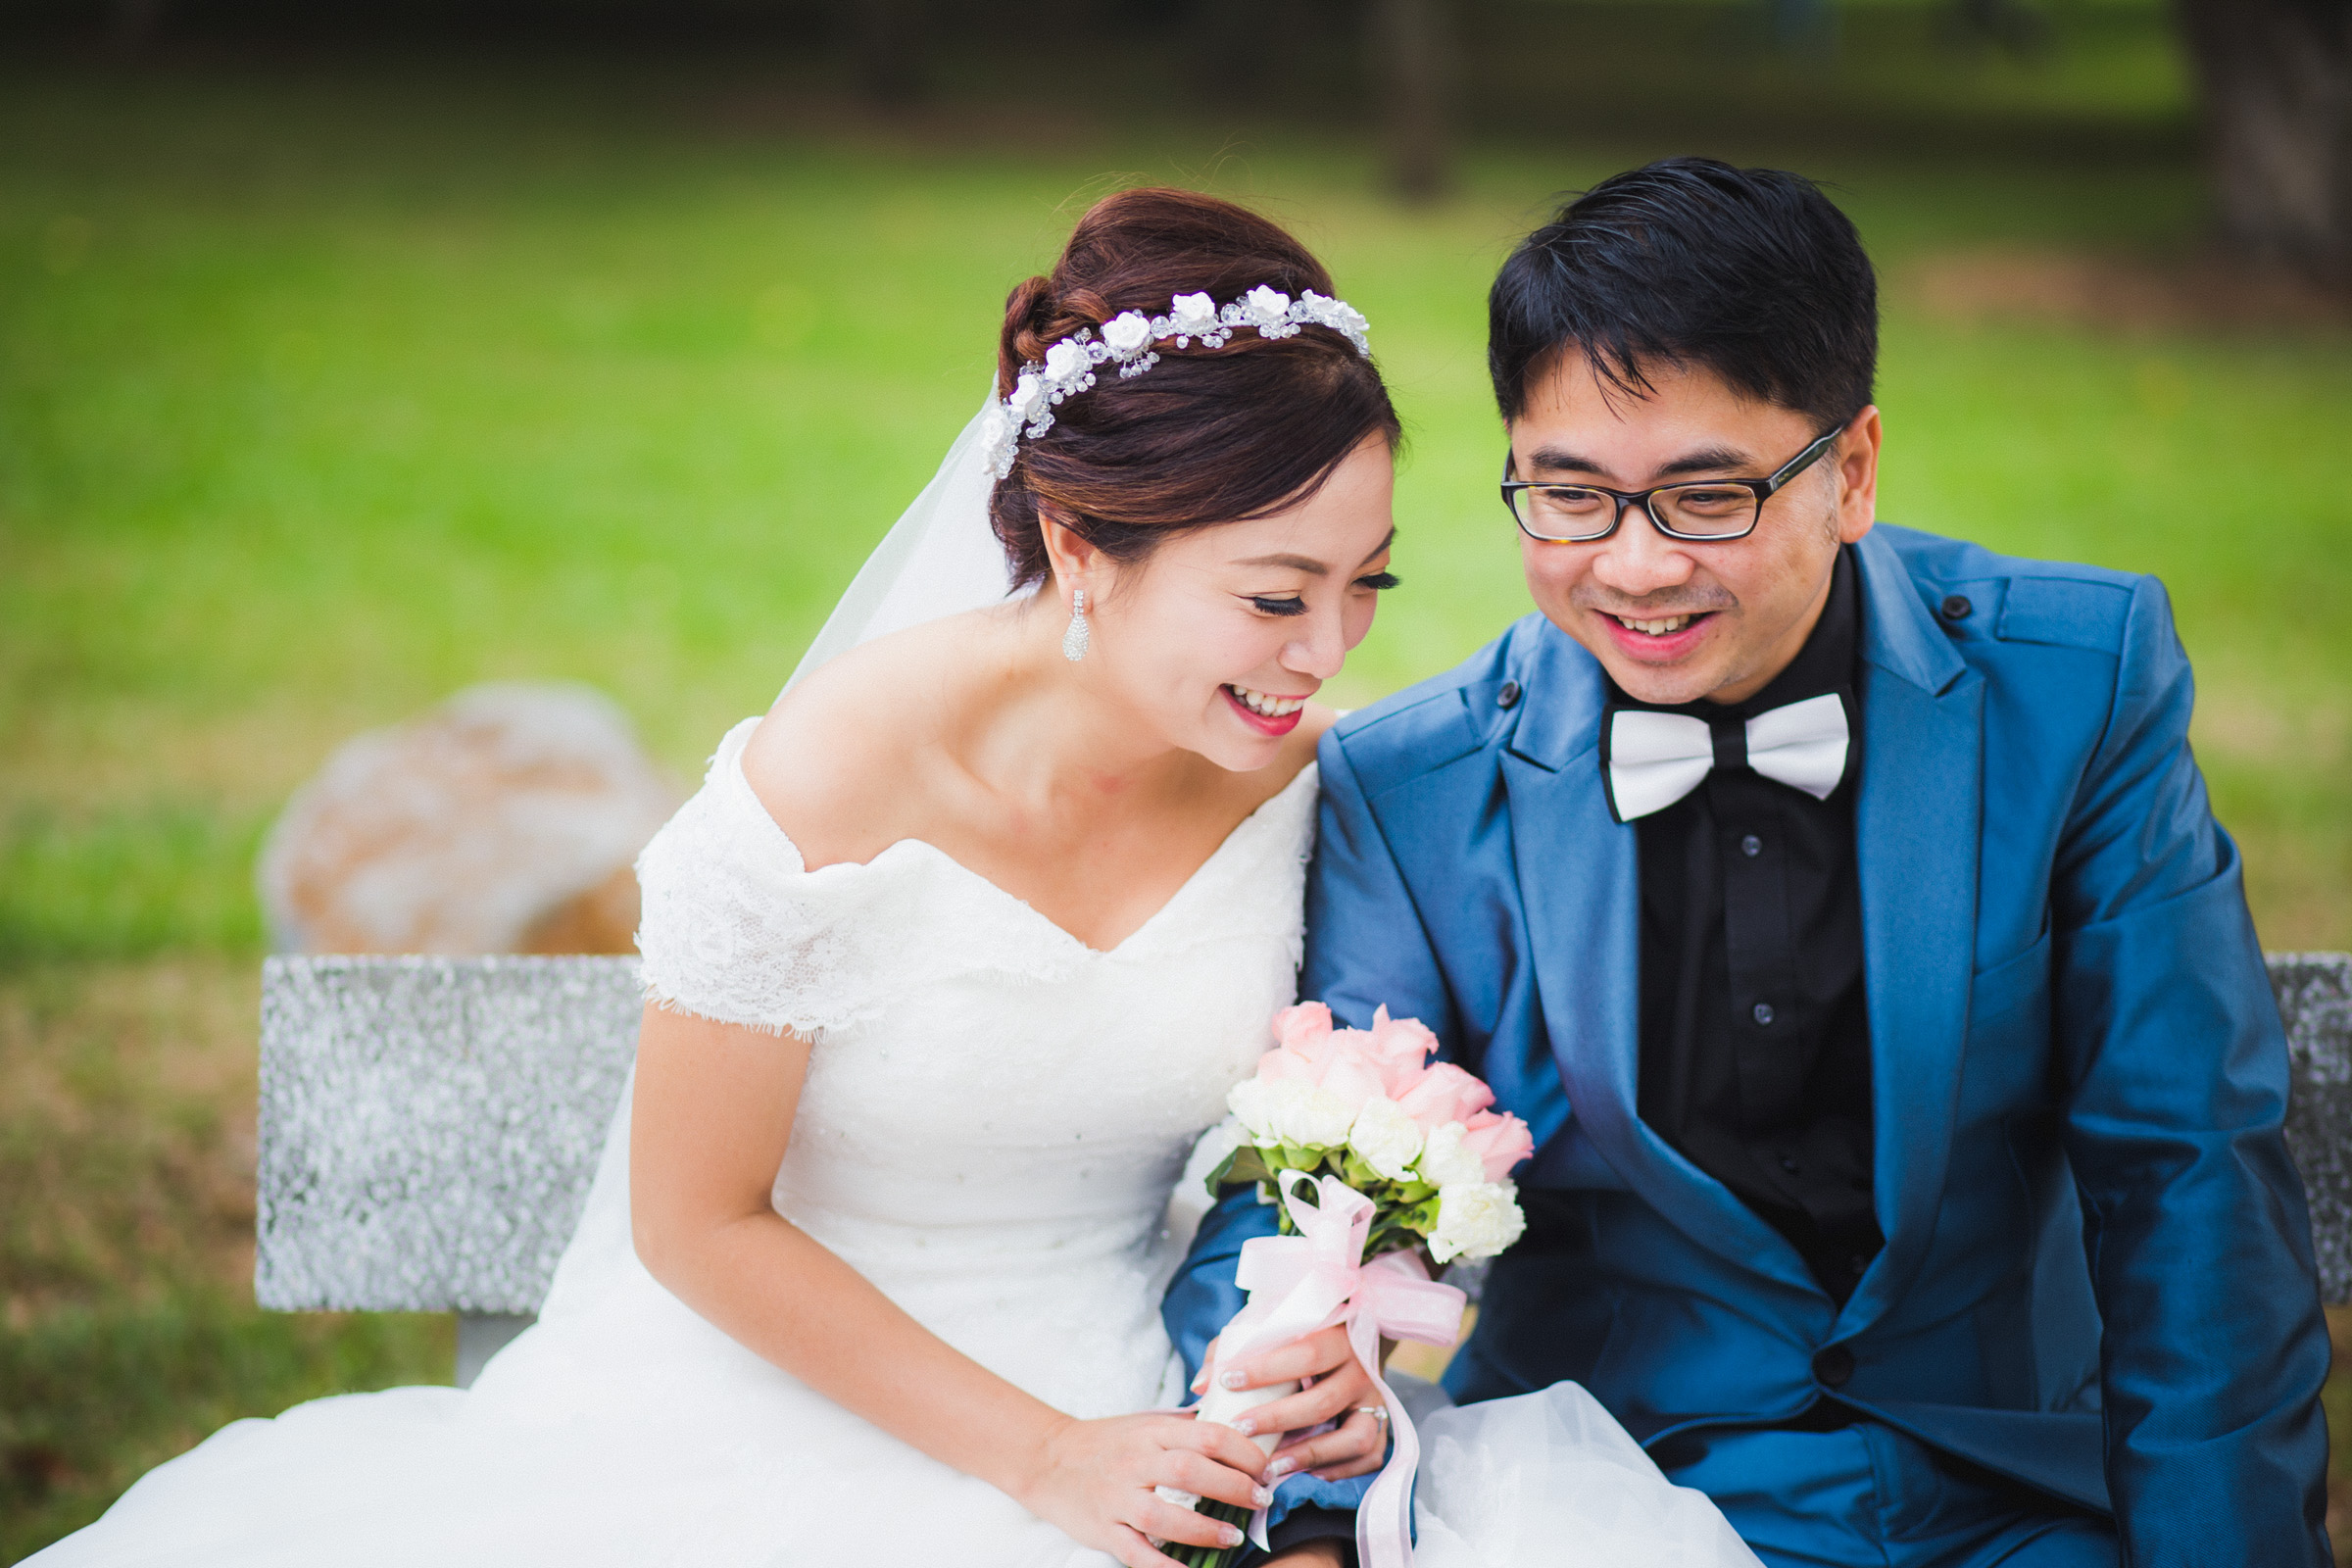 Steven_Jasmine_Wedding_Walldrobe Photography_Wedding shoots_Actual day wedding_Photographer (18)